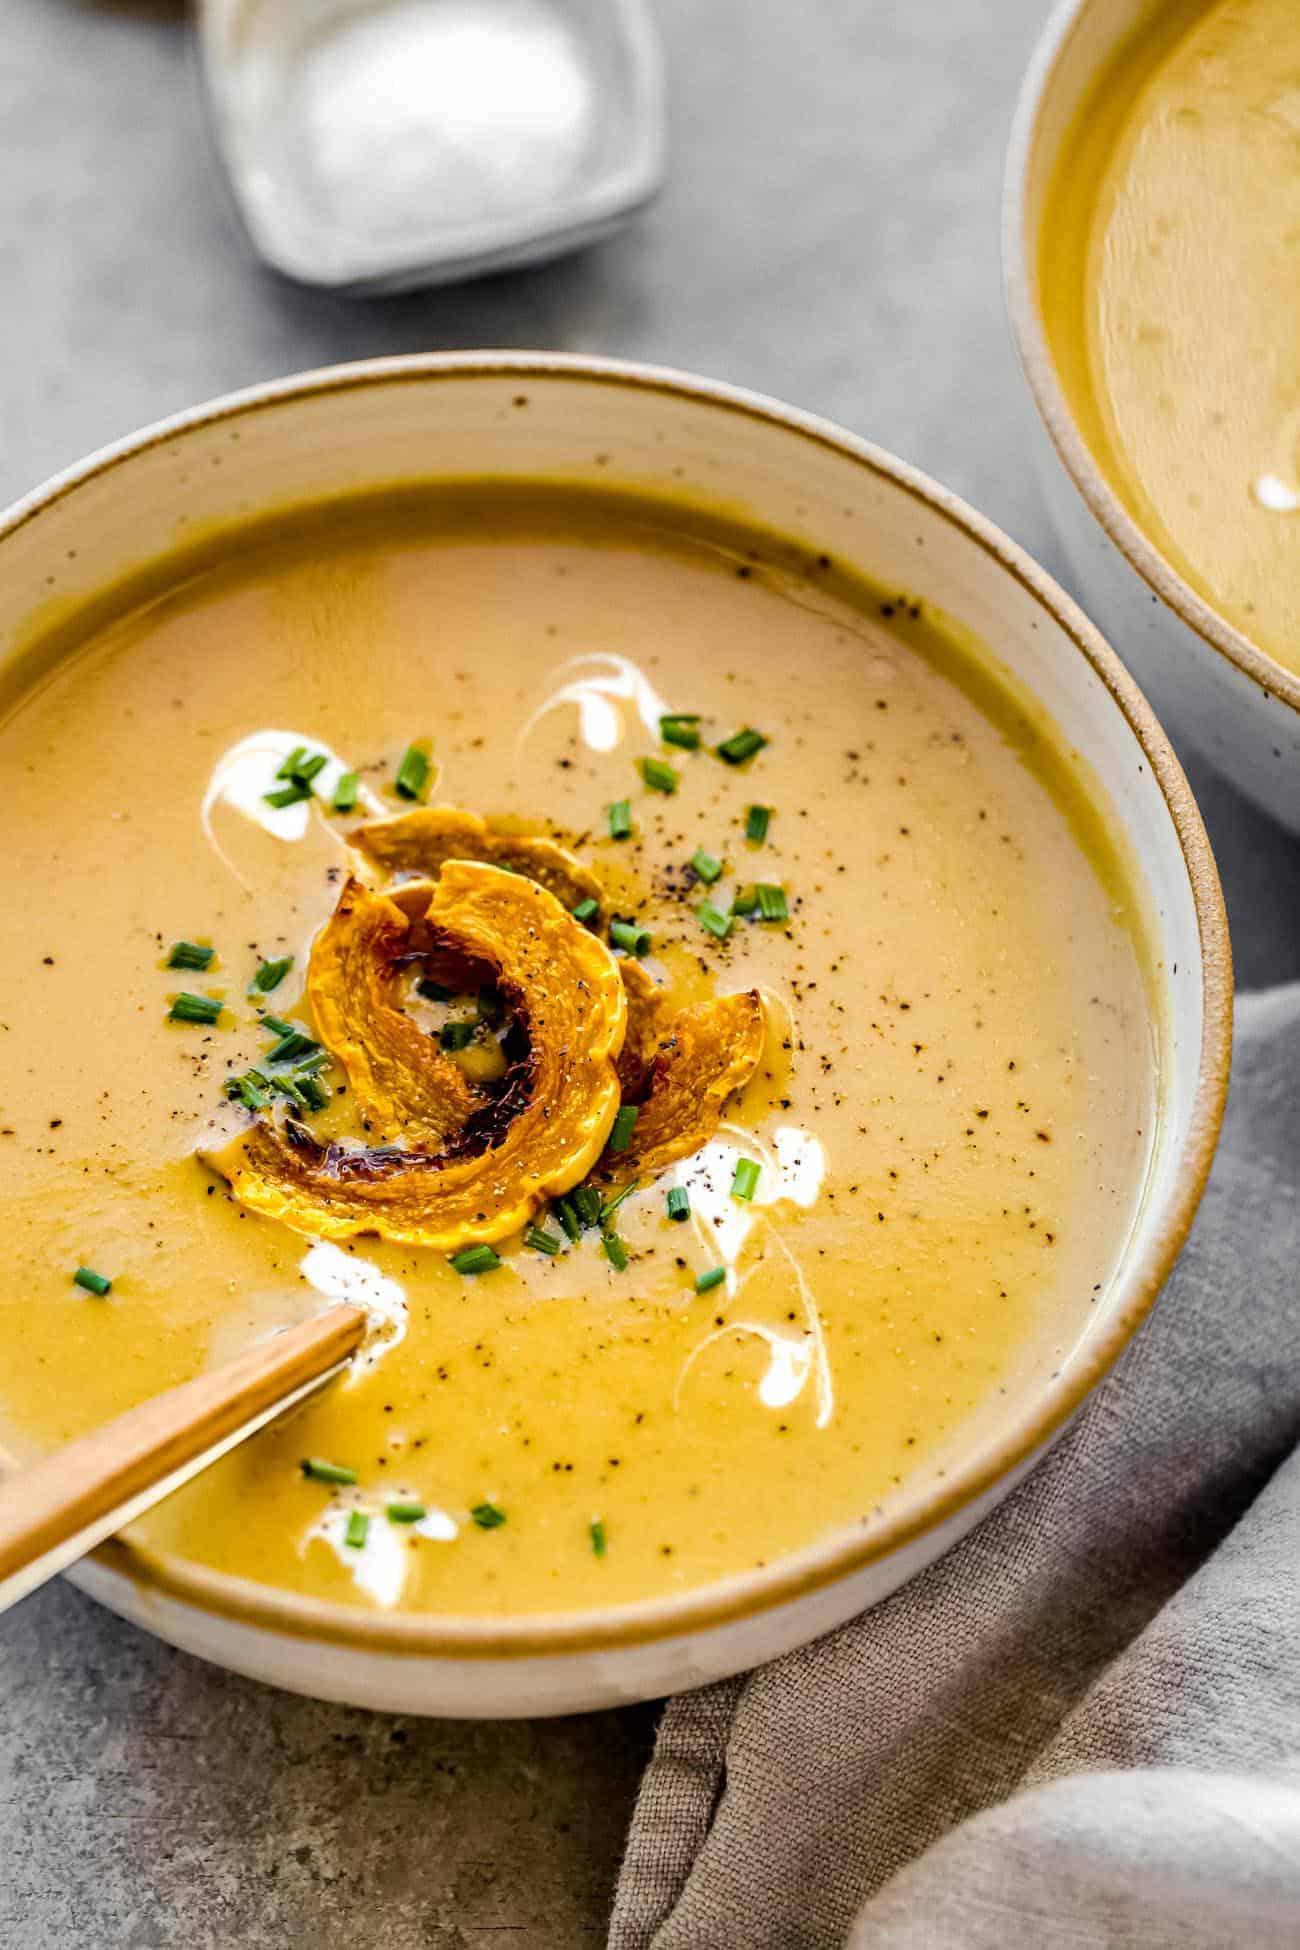 creamy delicata soup with roasted delicata squash on top